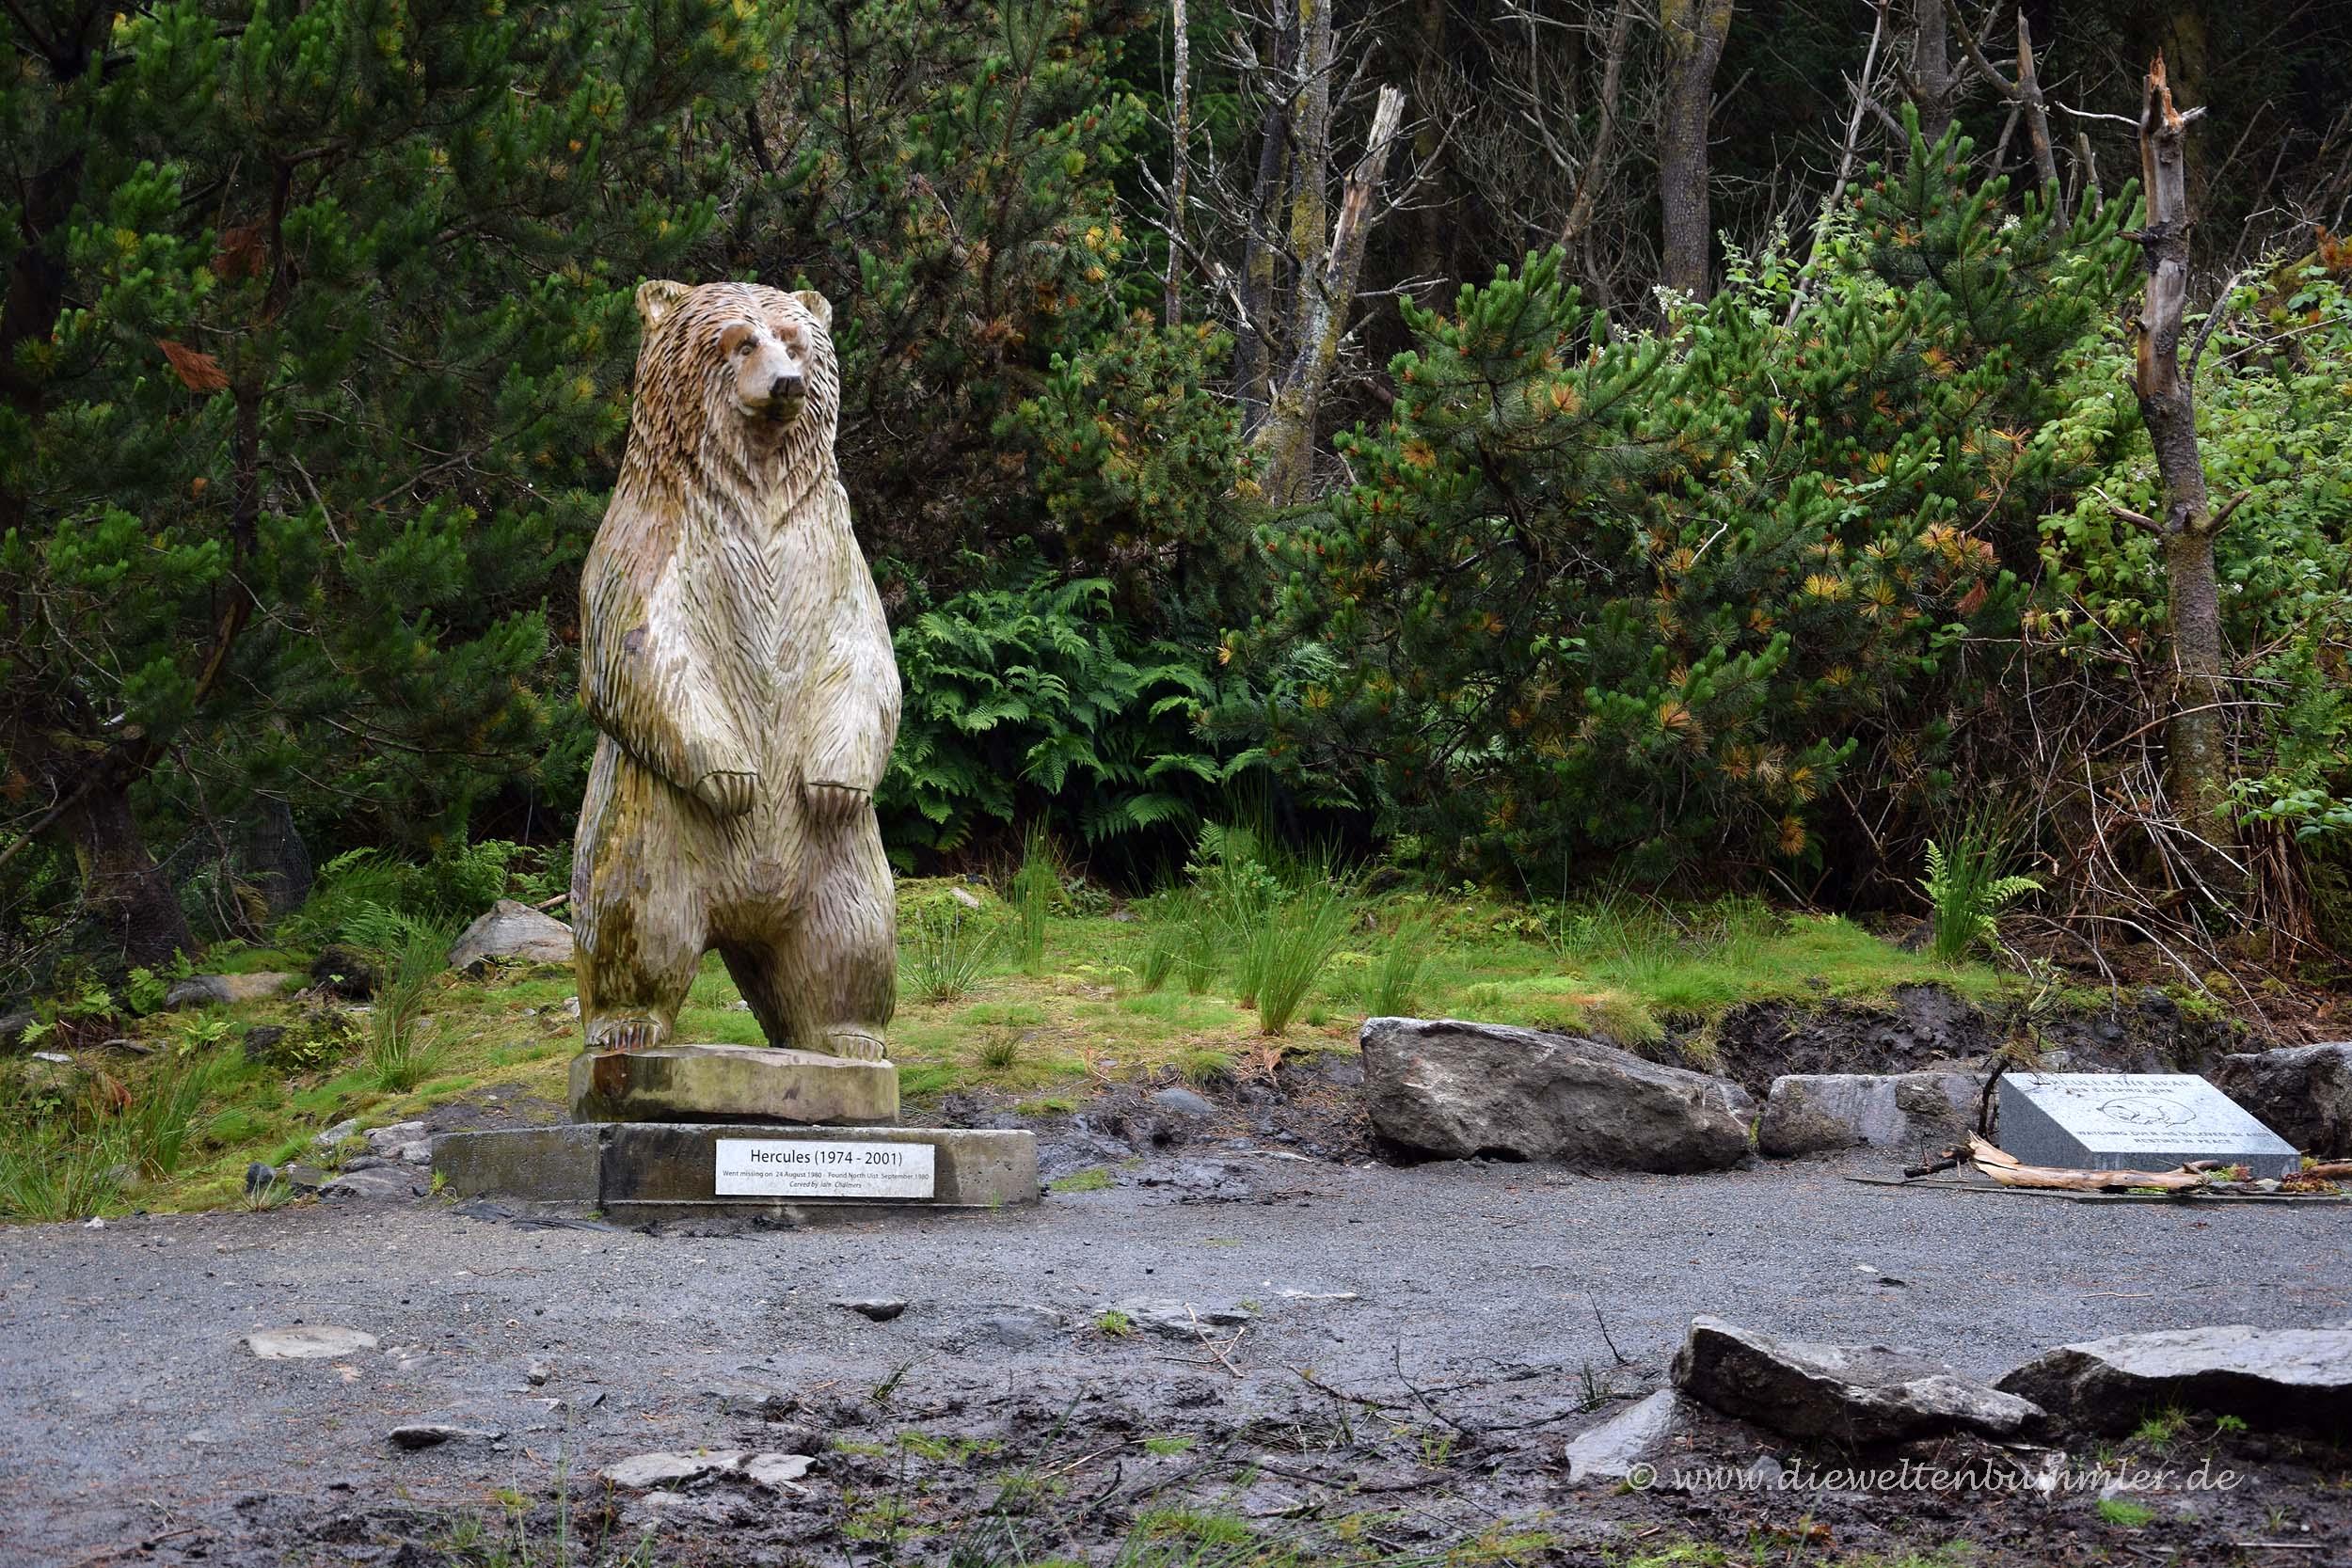 Hercules der Grizzlybär